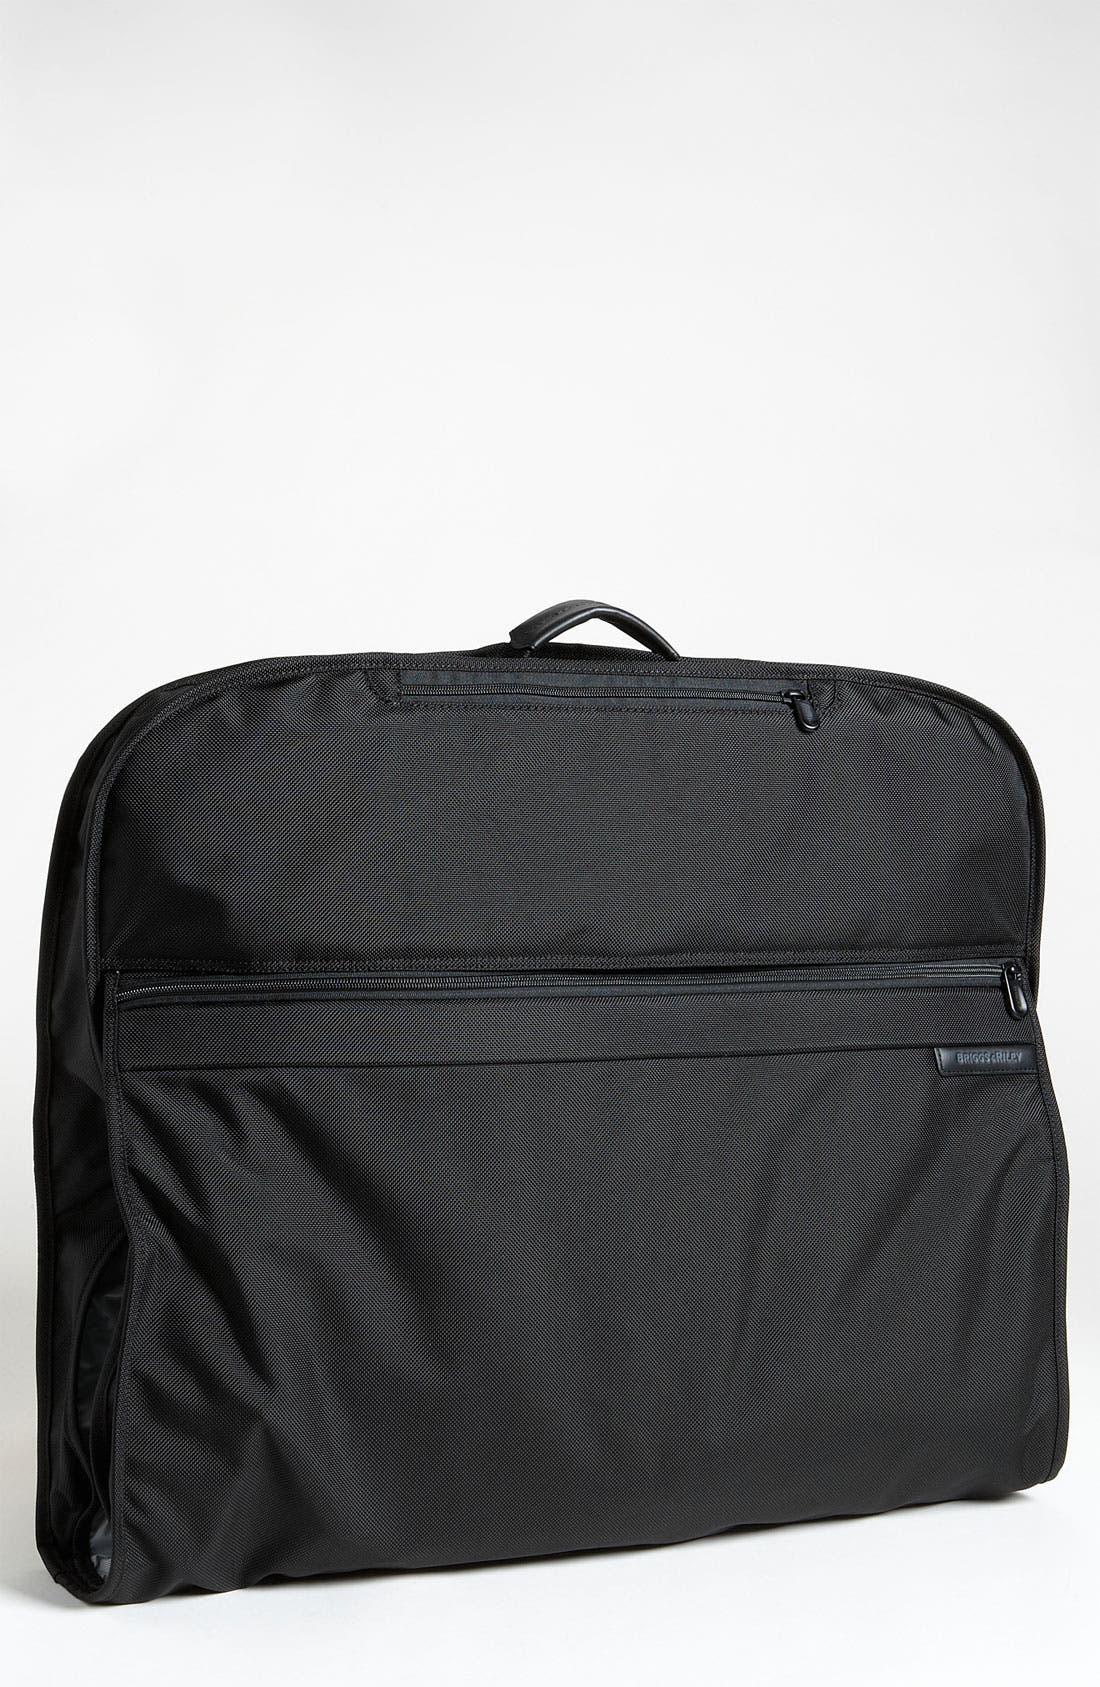 BRIGGS & RILEY 'Baseline - Classic' Garment Cover